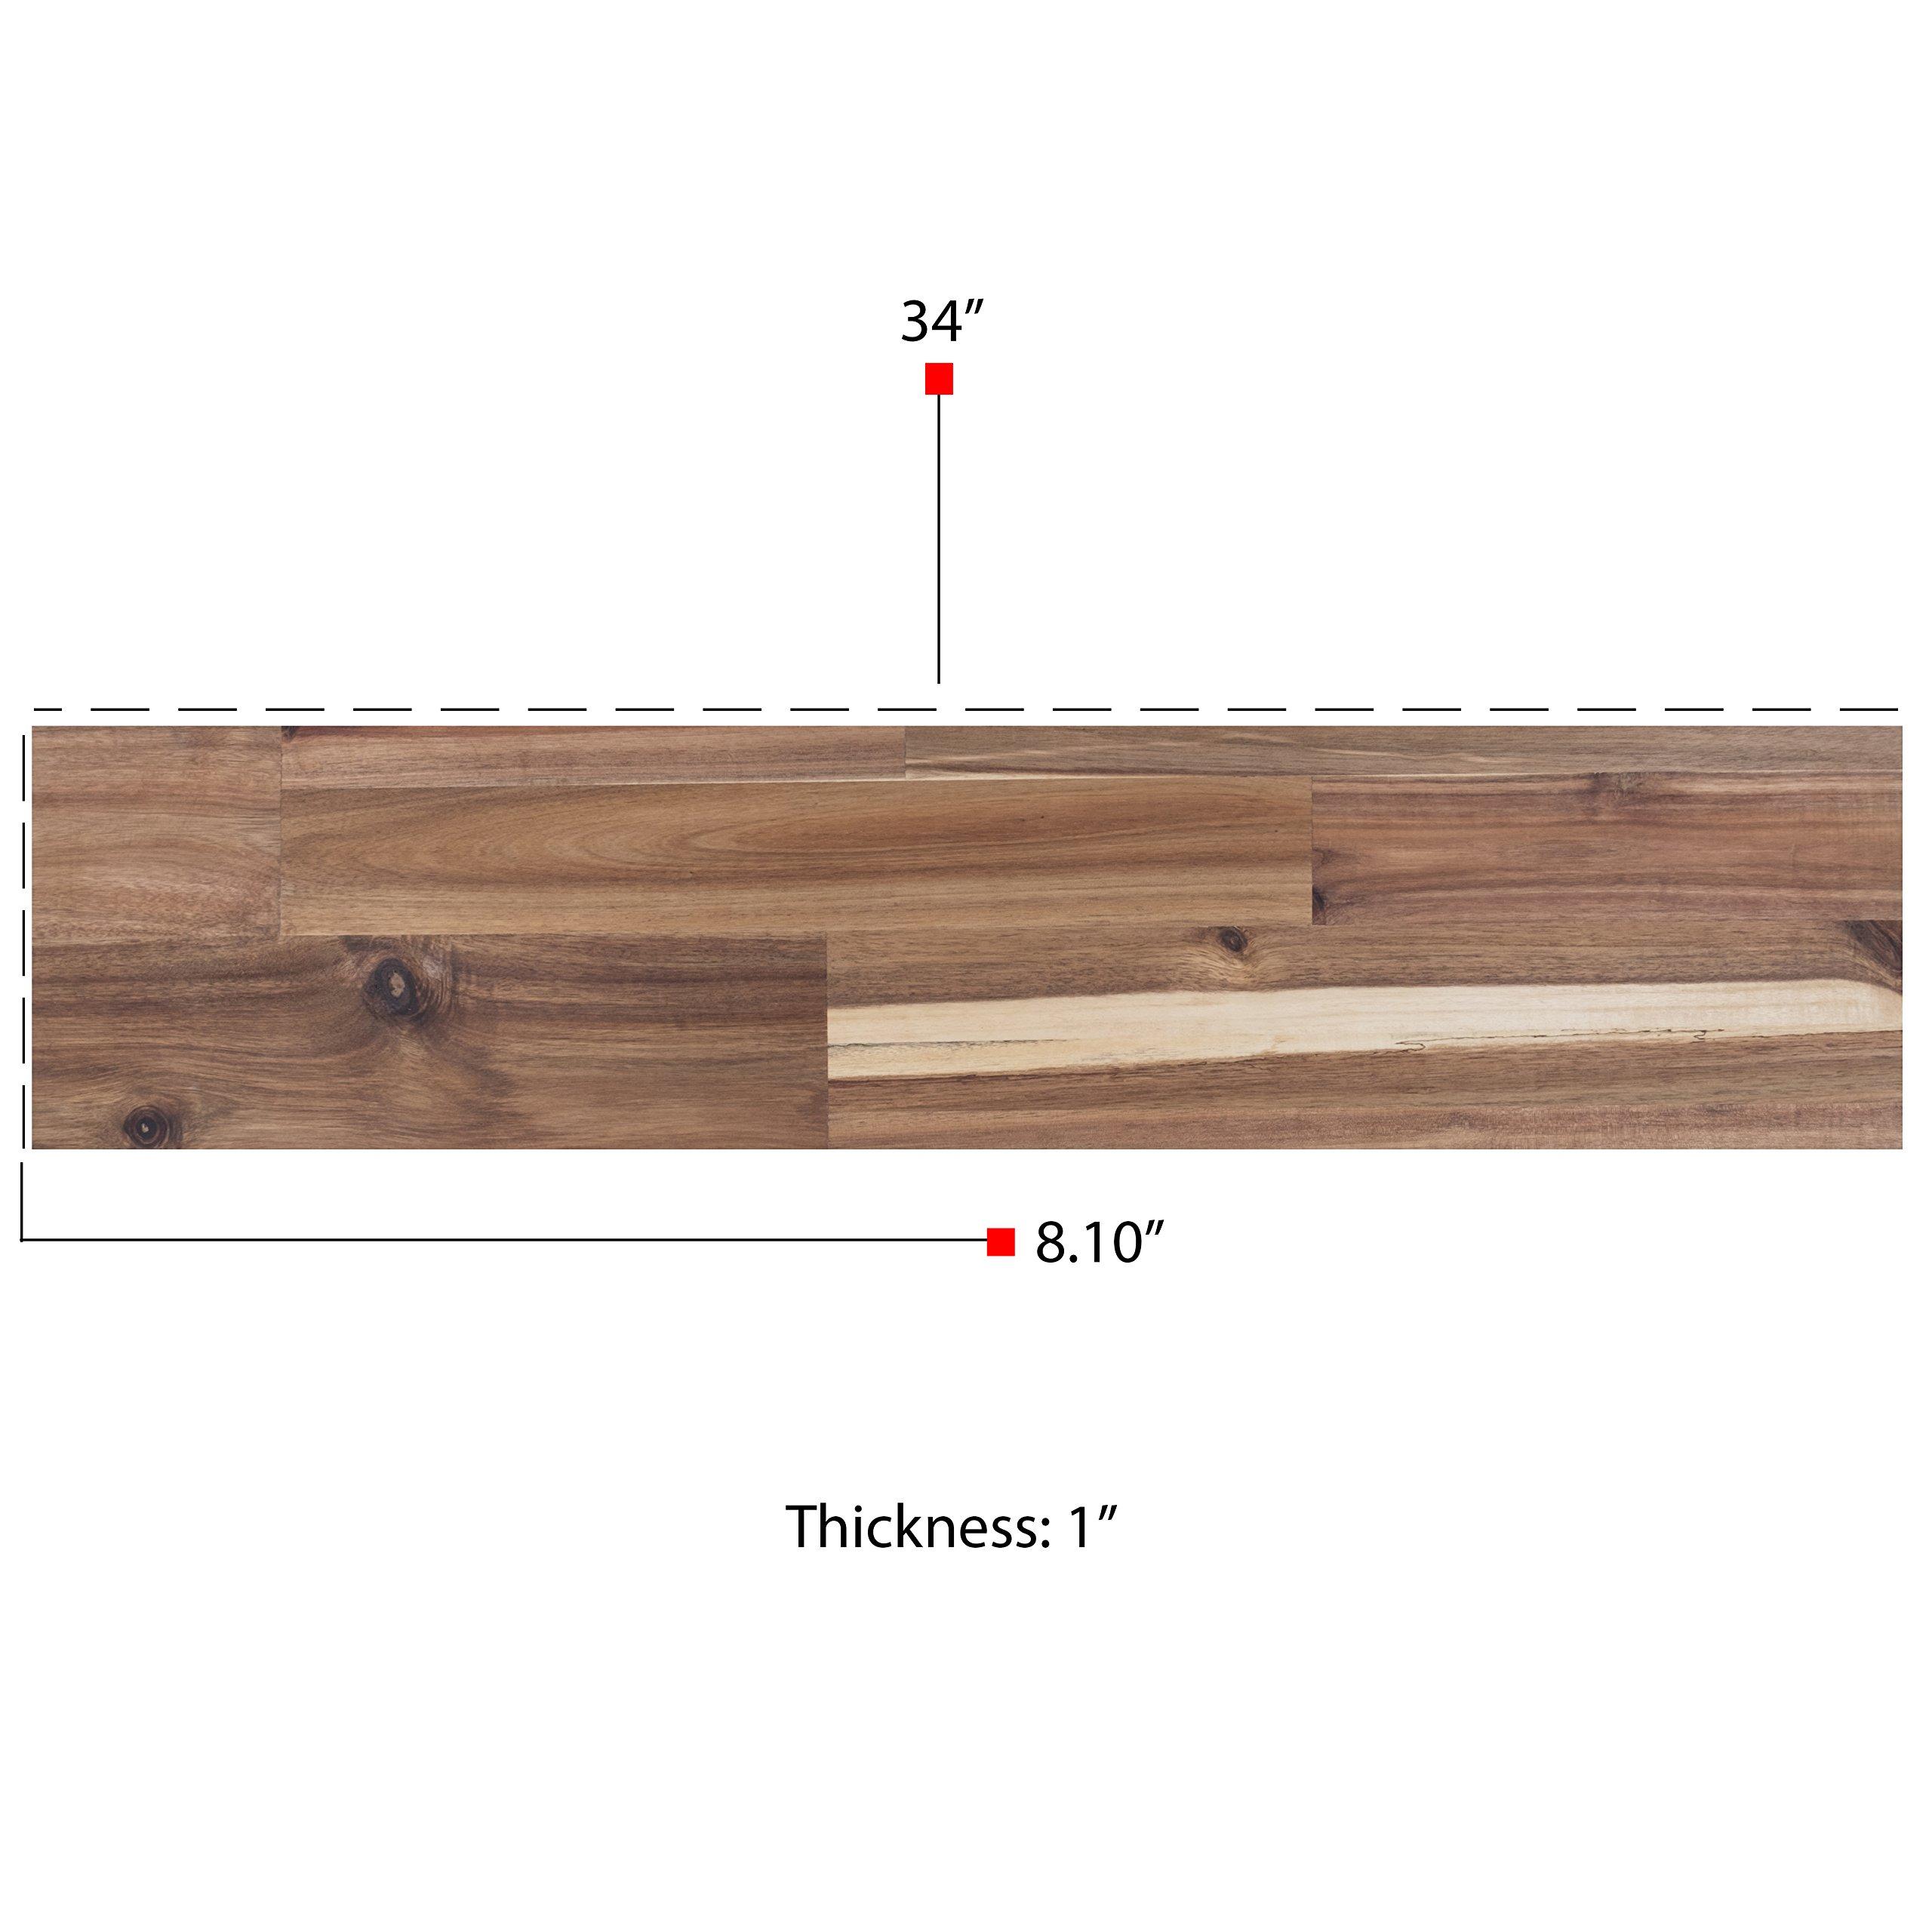 Bright Maison Wall Mountable Rectangular Cheese Serving Board and Decor Original Acacia Wood